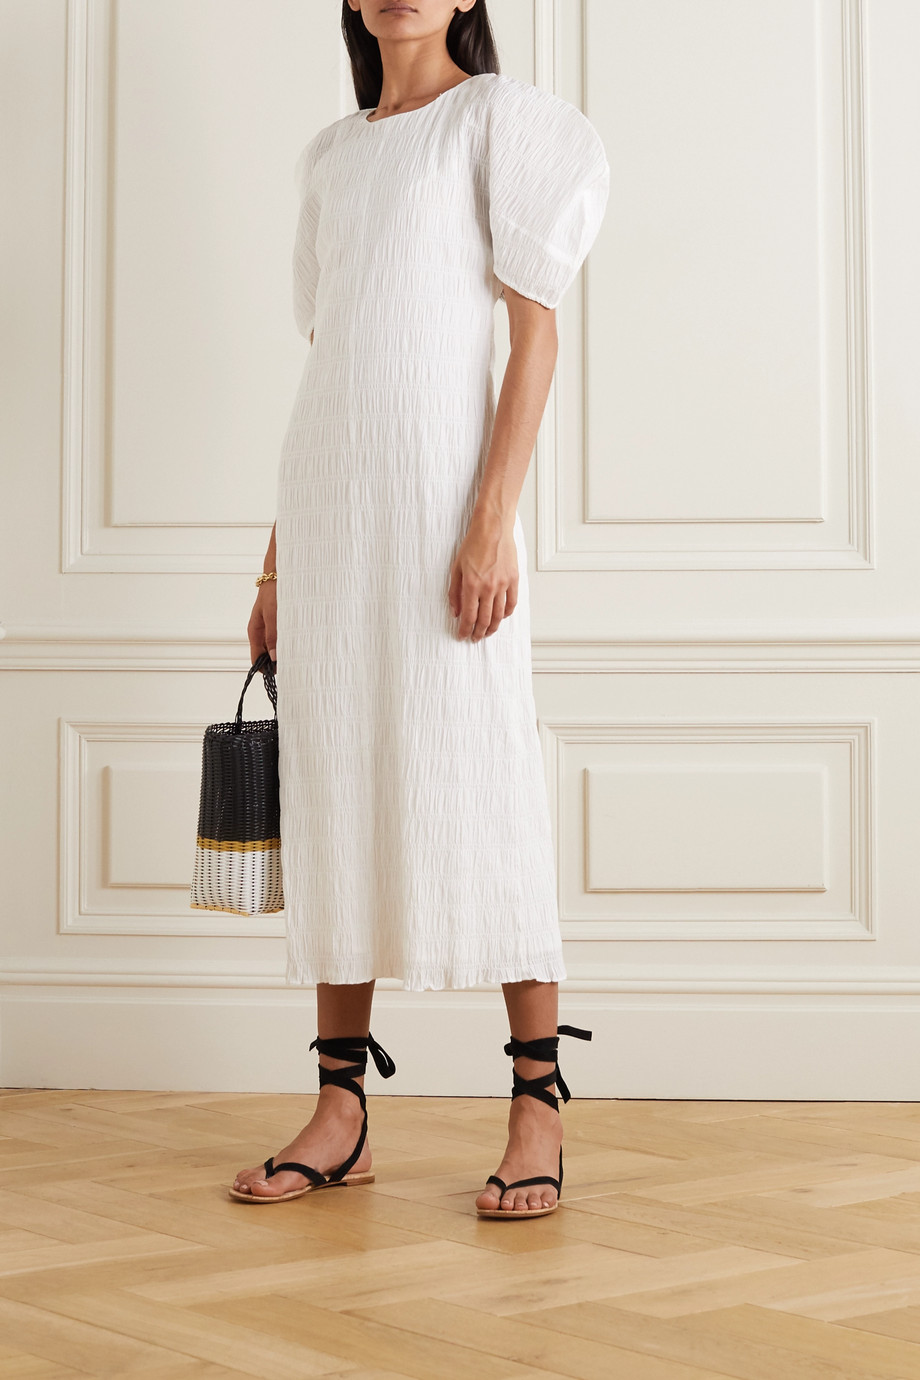 Mara Hoffman Aranza 皱褶装饰有机弹力棉质中长连衣裙